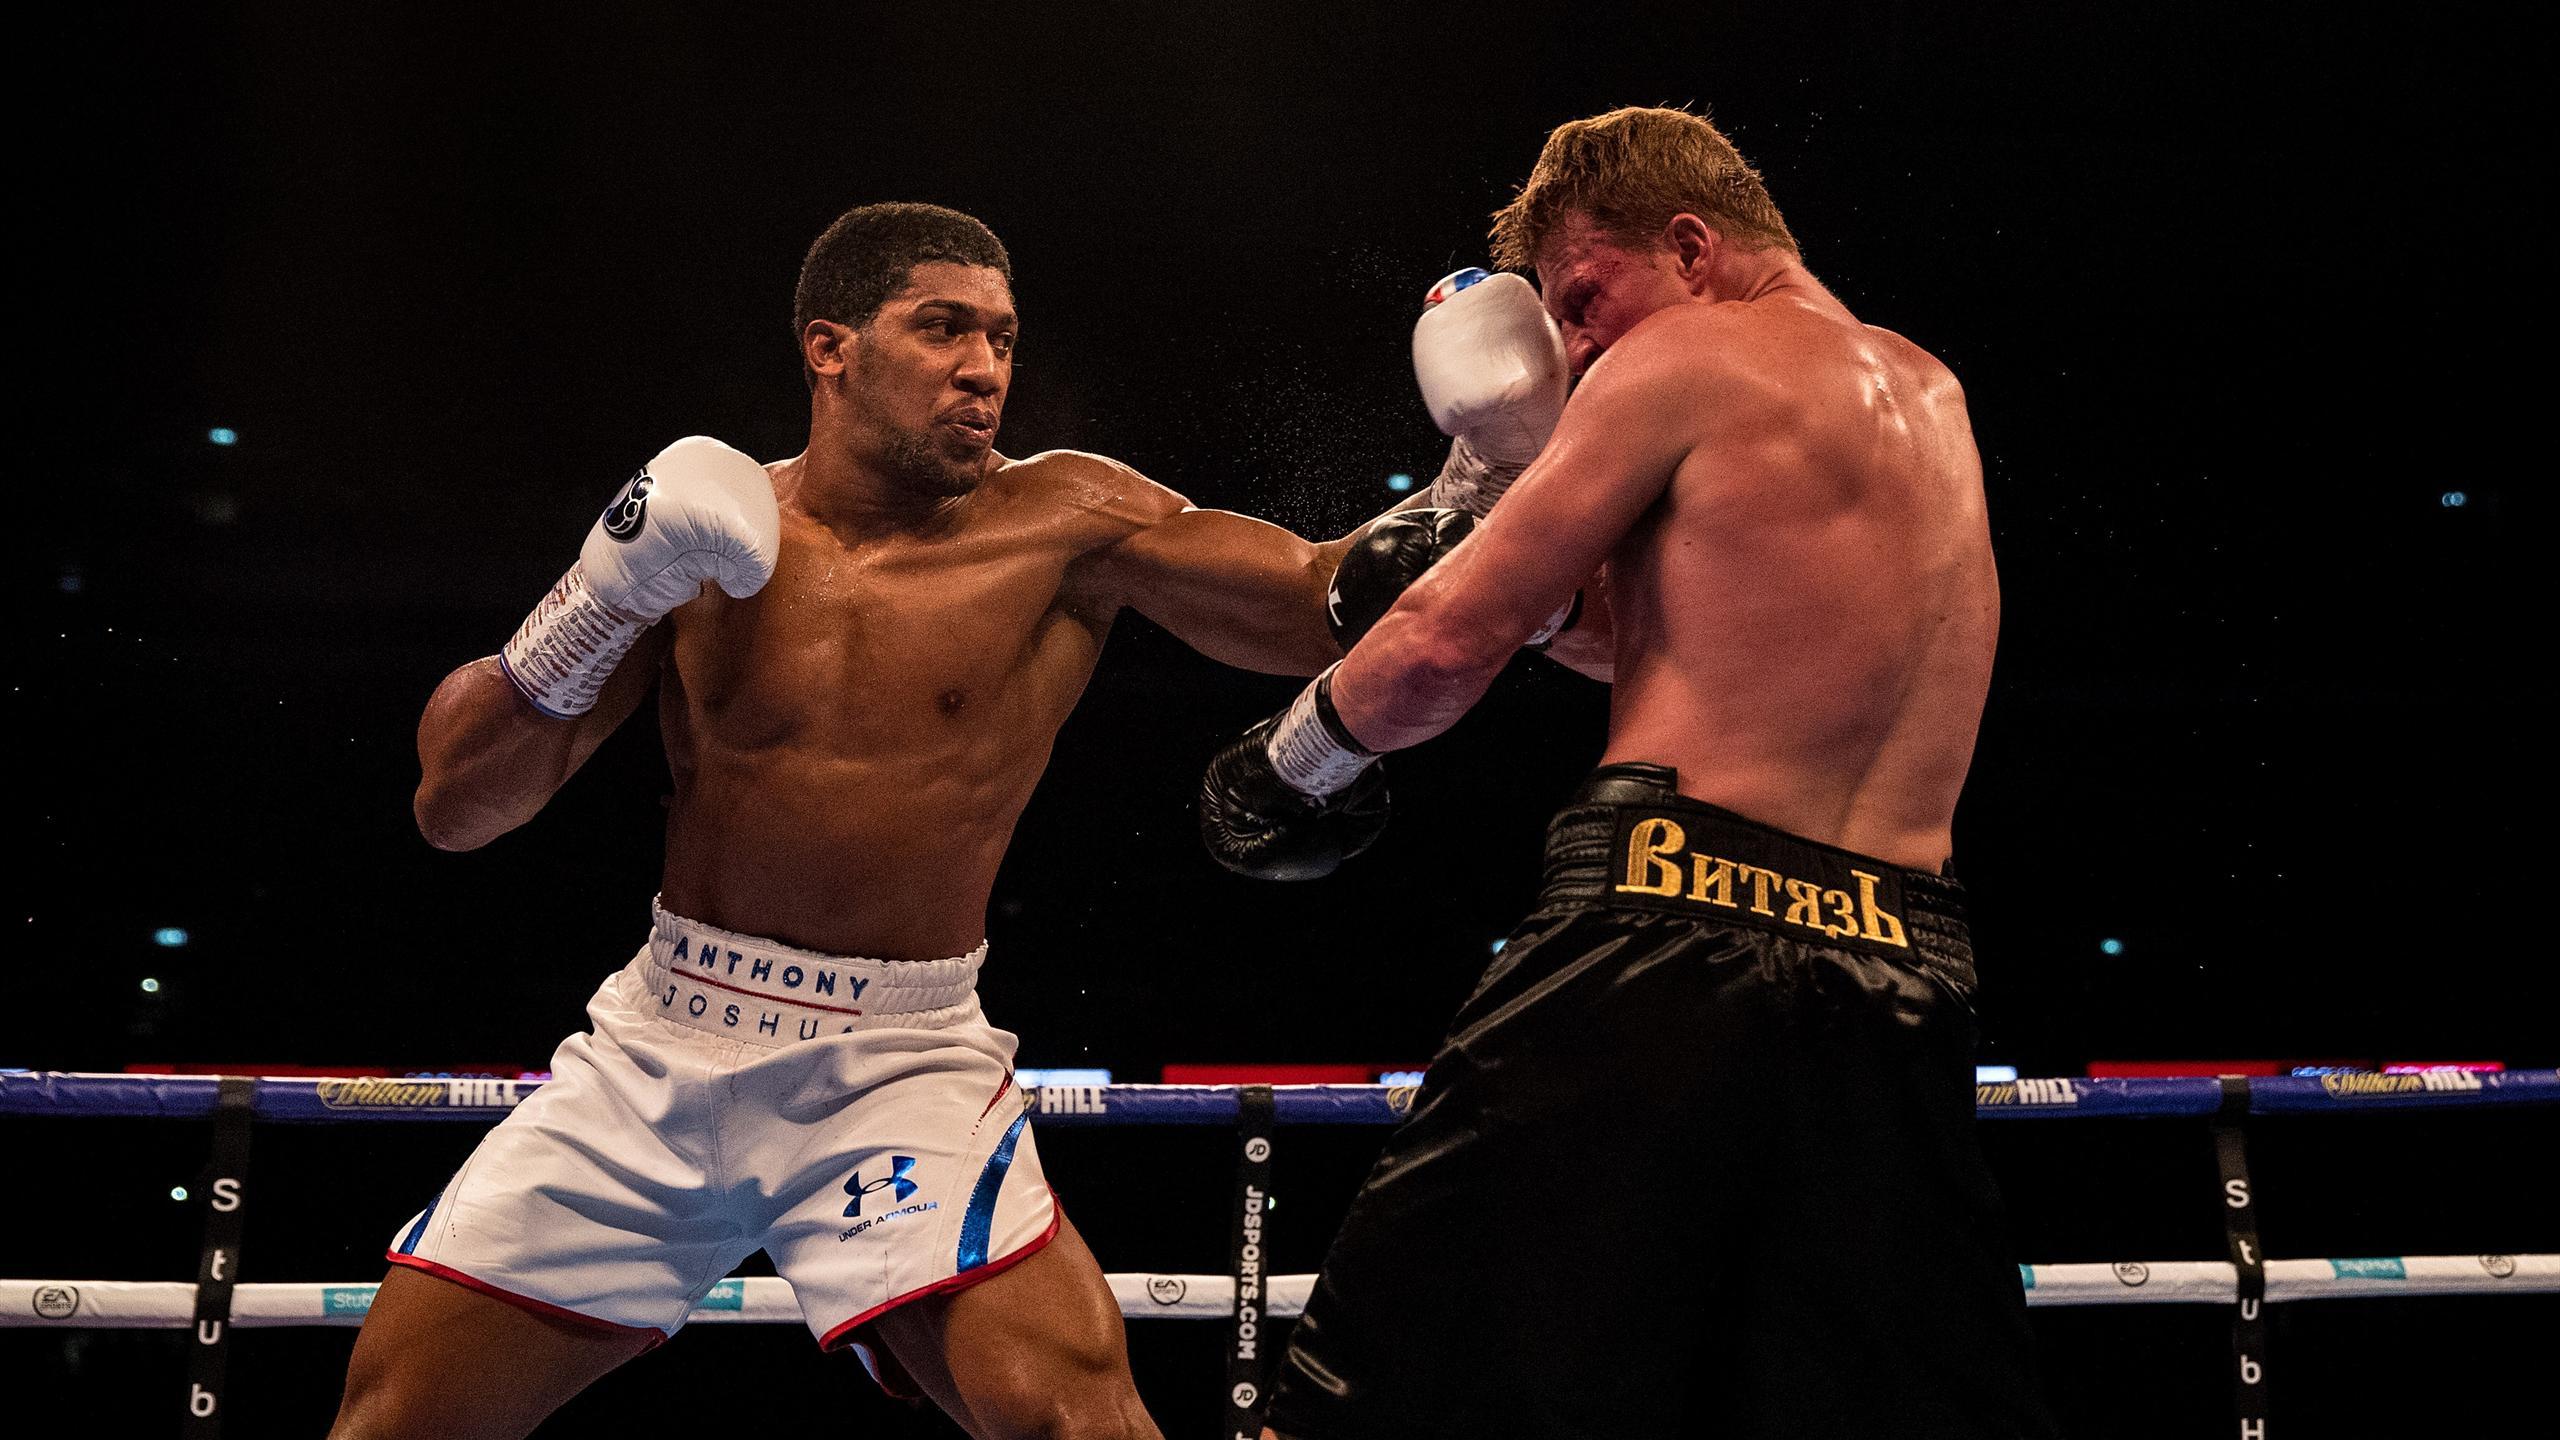 Boxing pics images 1